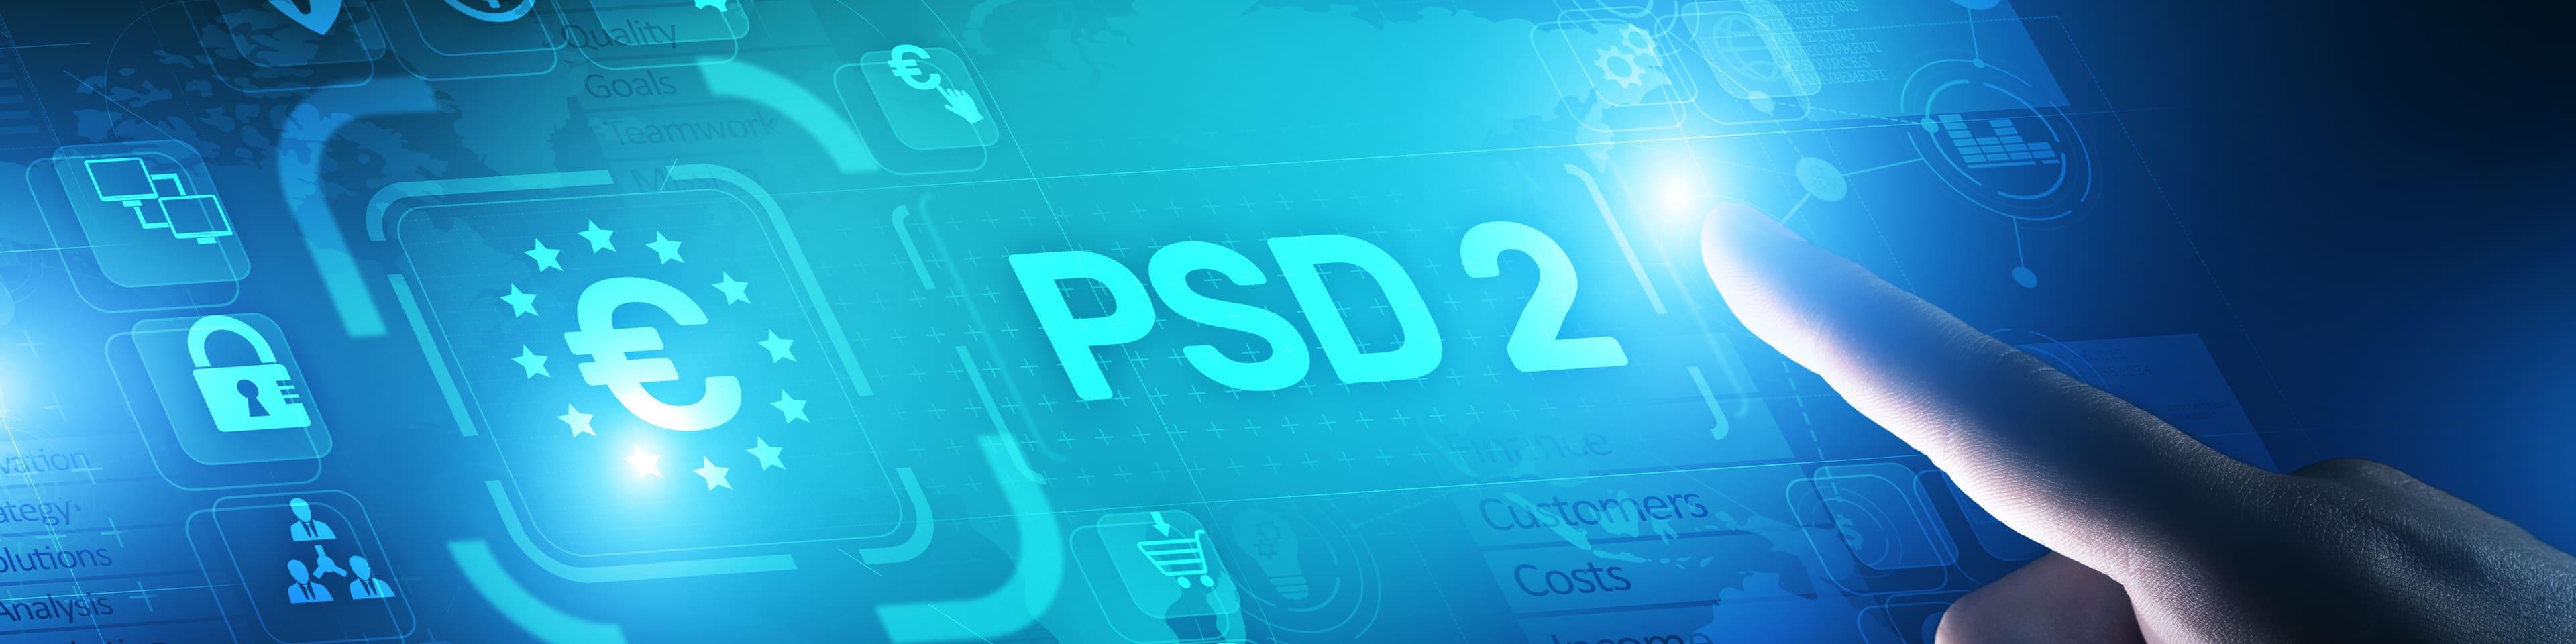 afbeelding met tekst PSD2